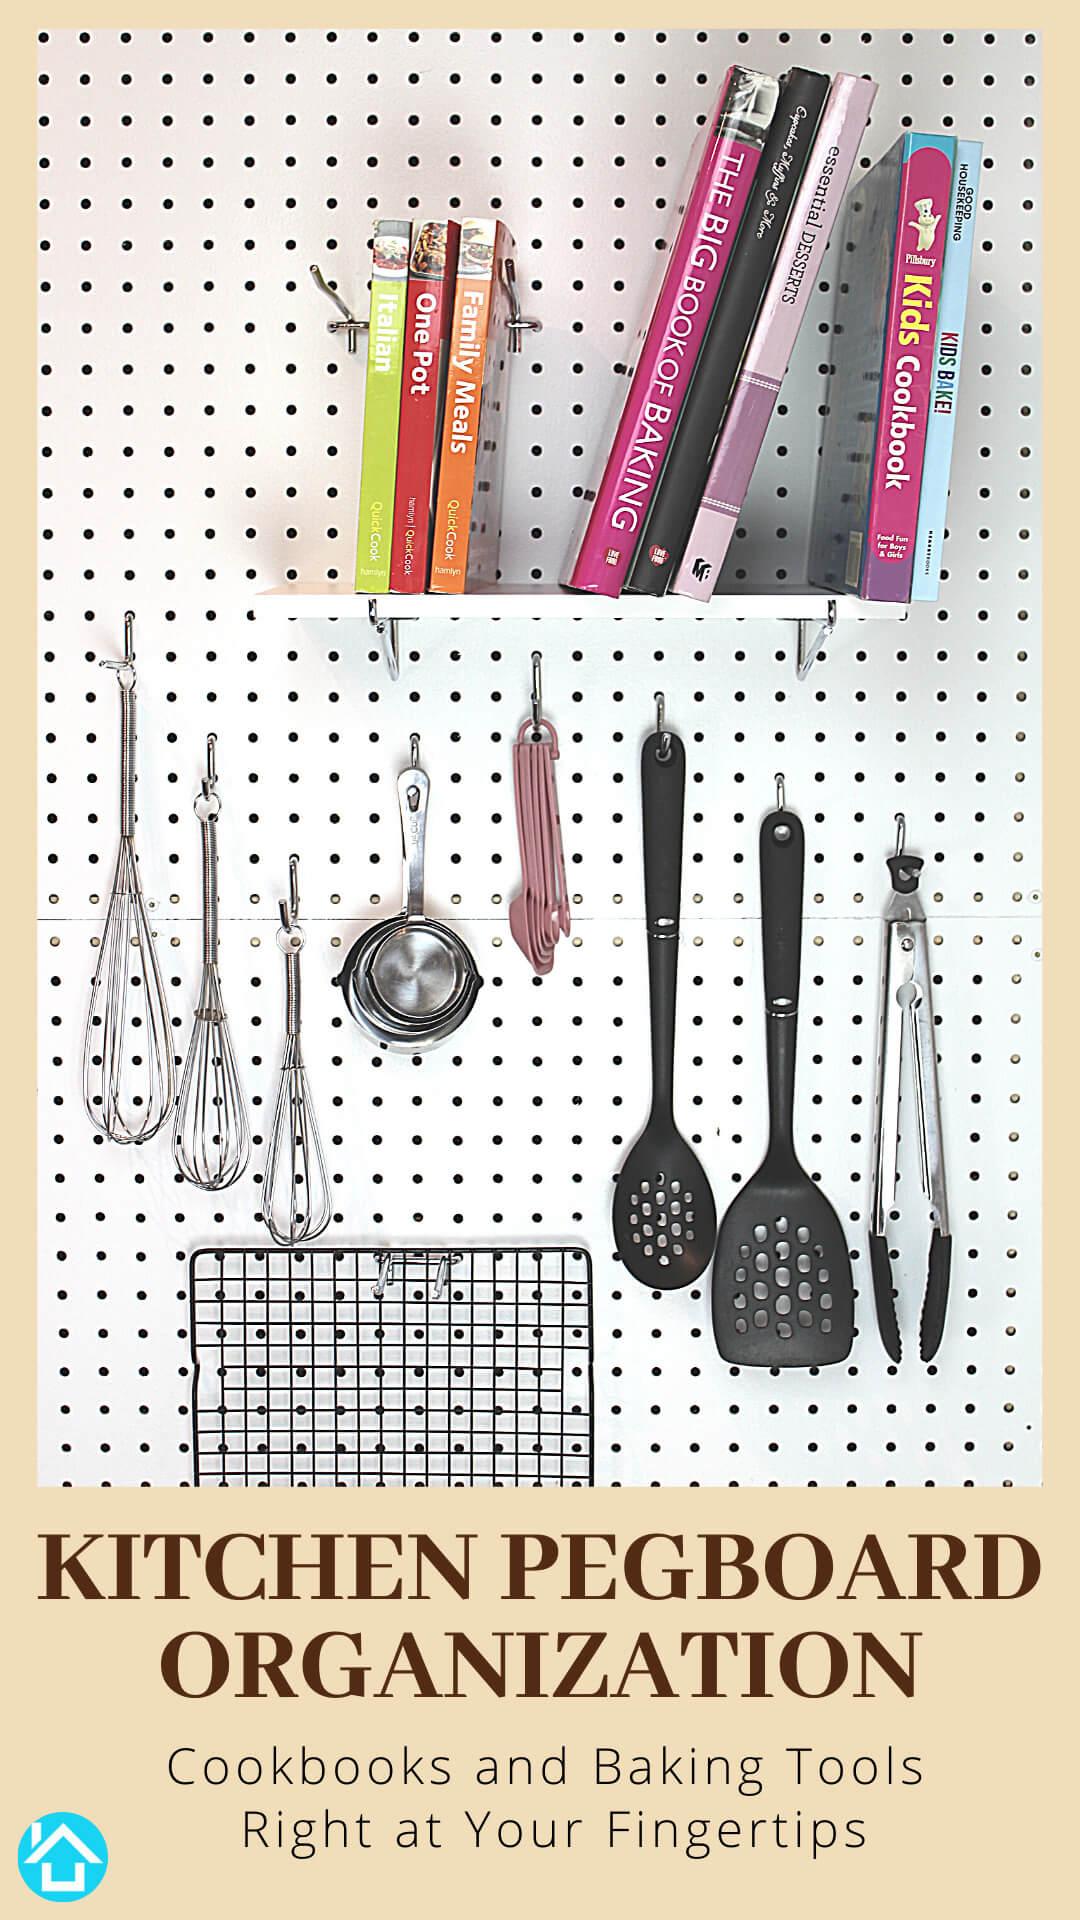 Pegboard Shelf for Cookbooks